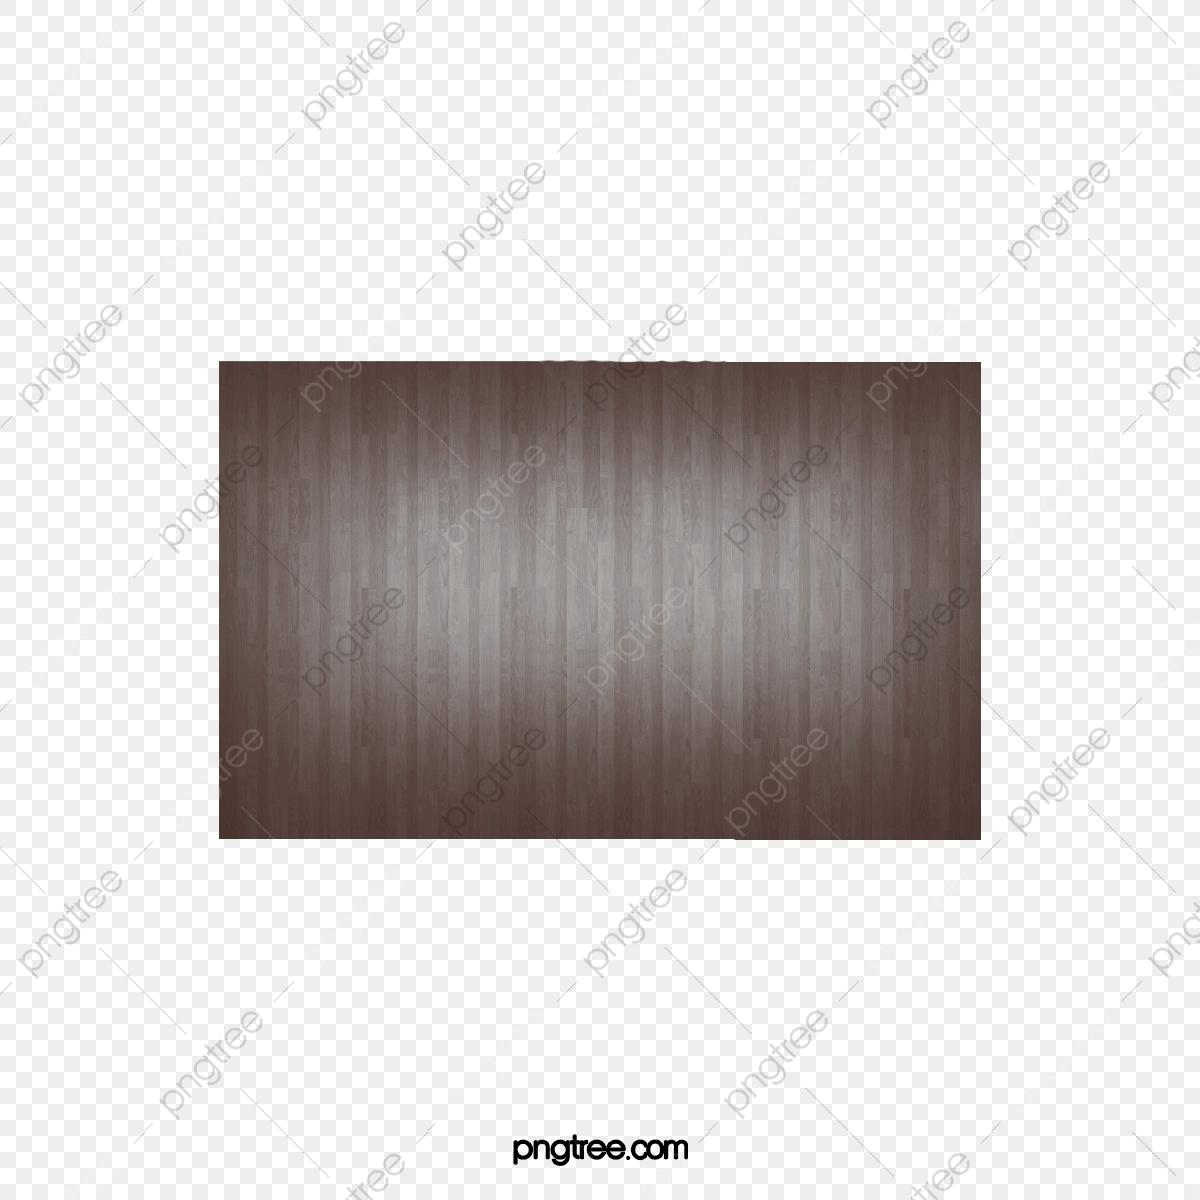 Black Plank Background, Wood Texture, Wood Floor, Wooden.